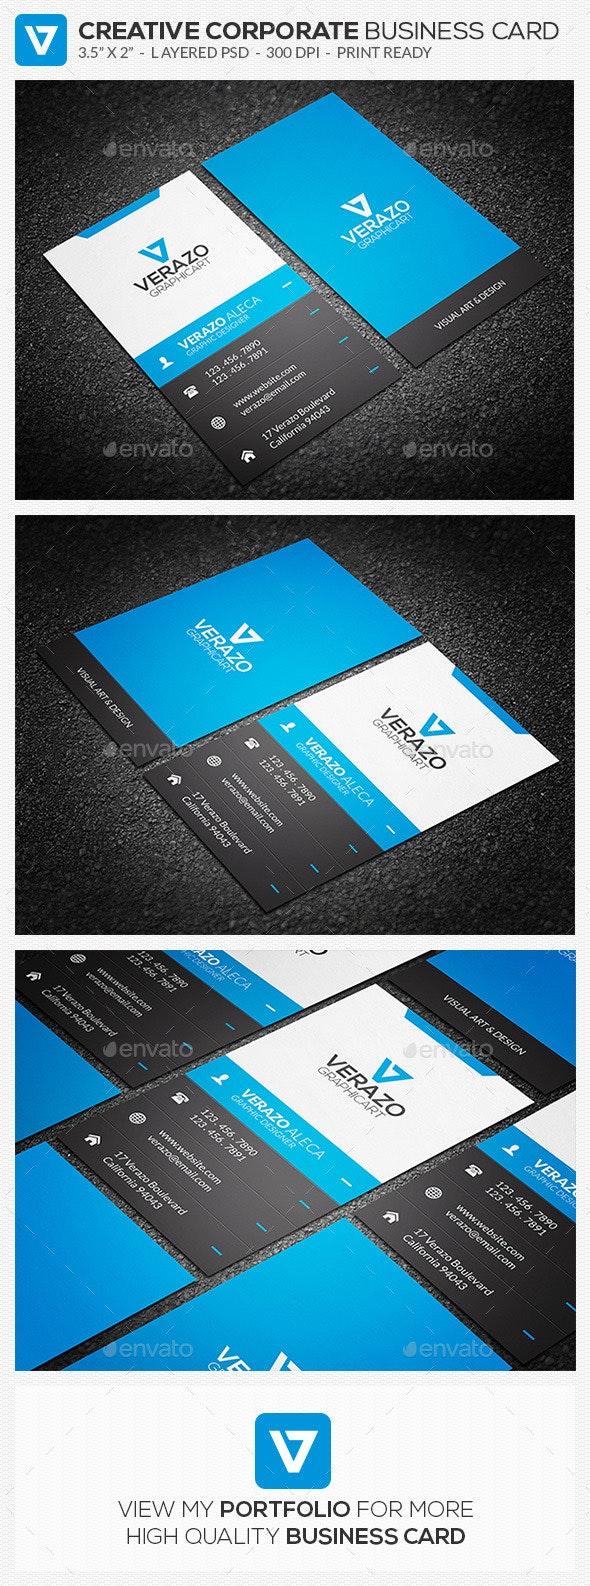 Creative Corporate Business Card 61 - Creative Business Cards